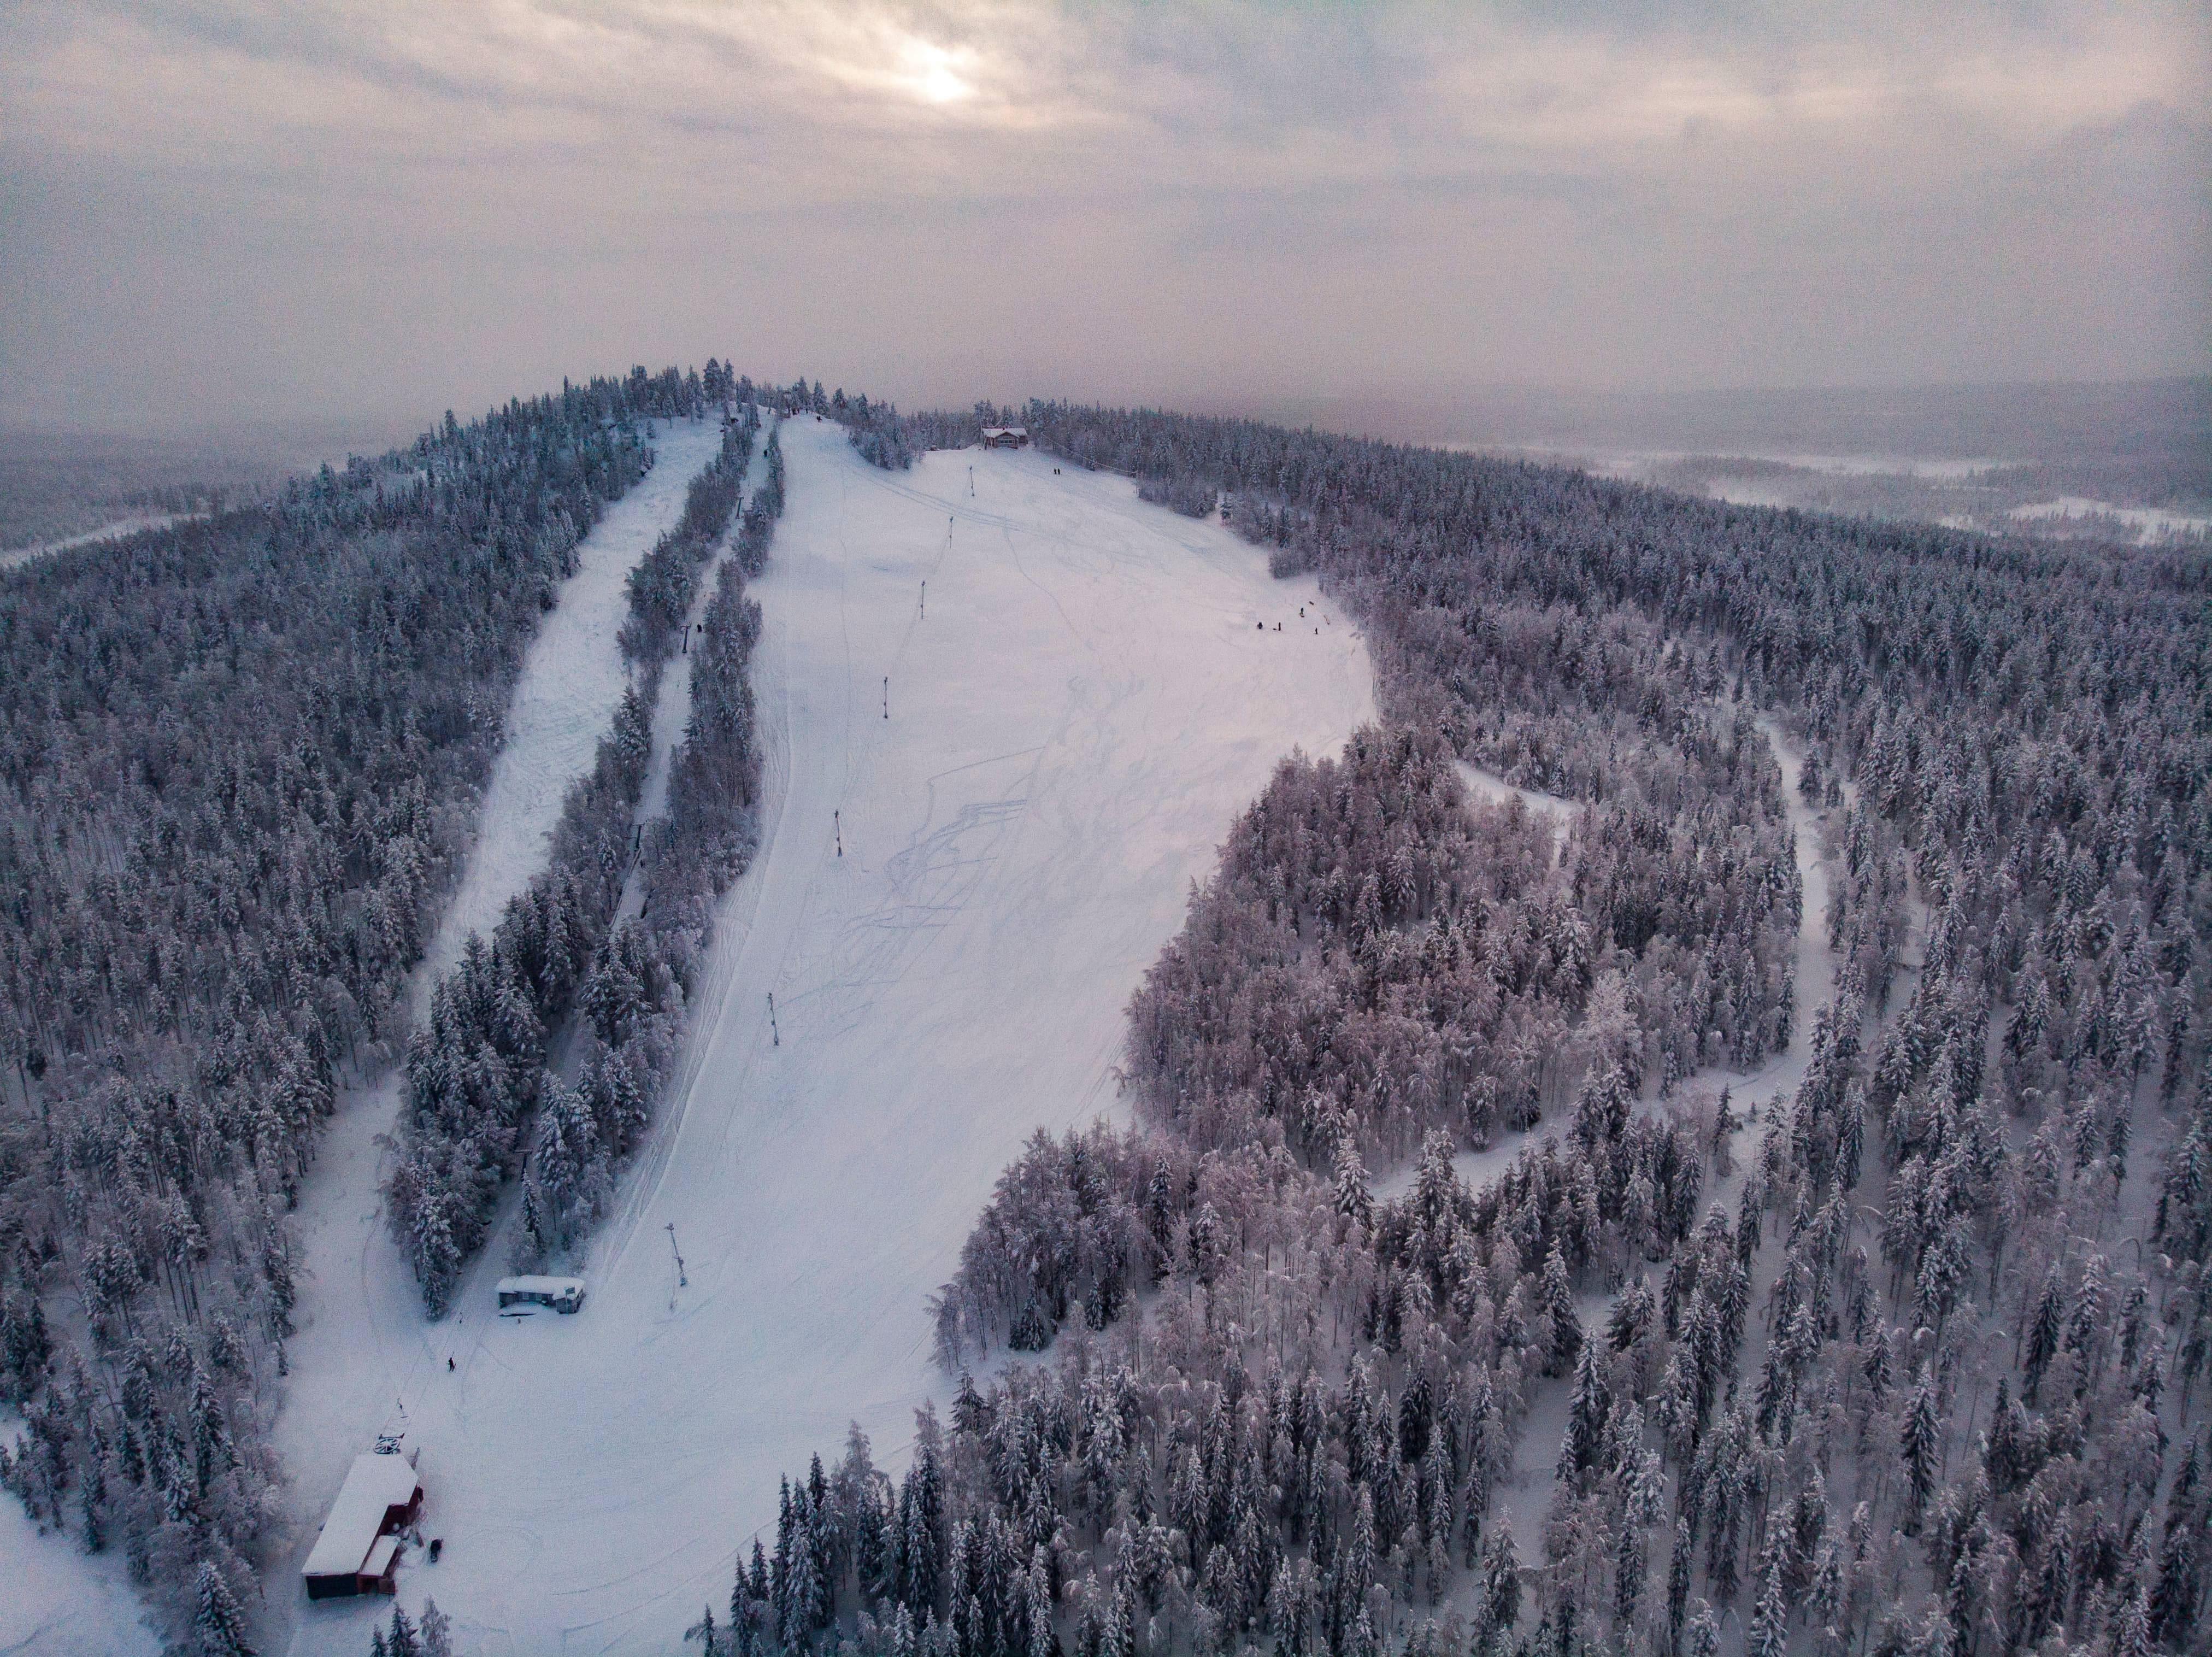 Solia - Ski resort